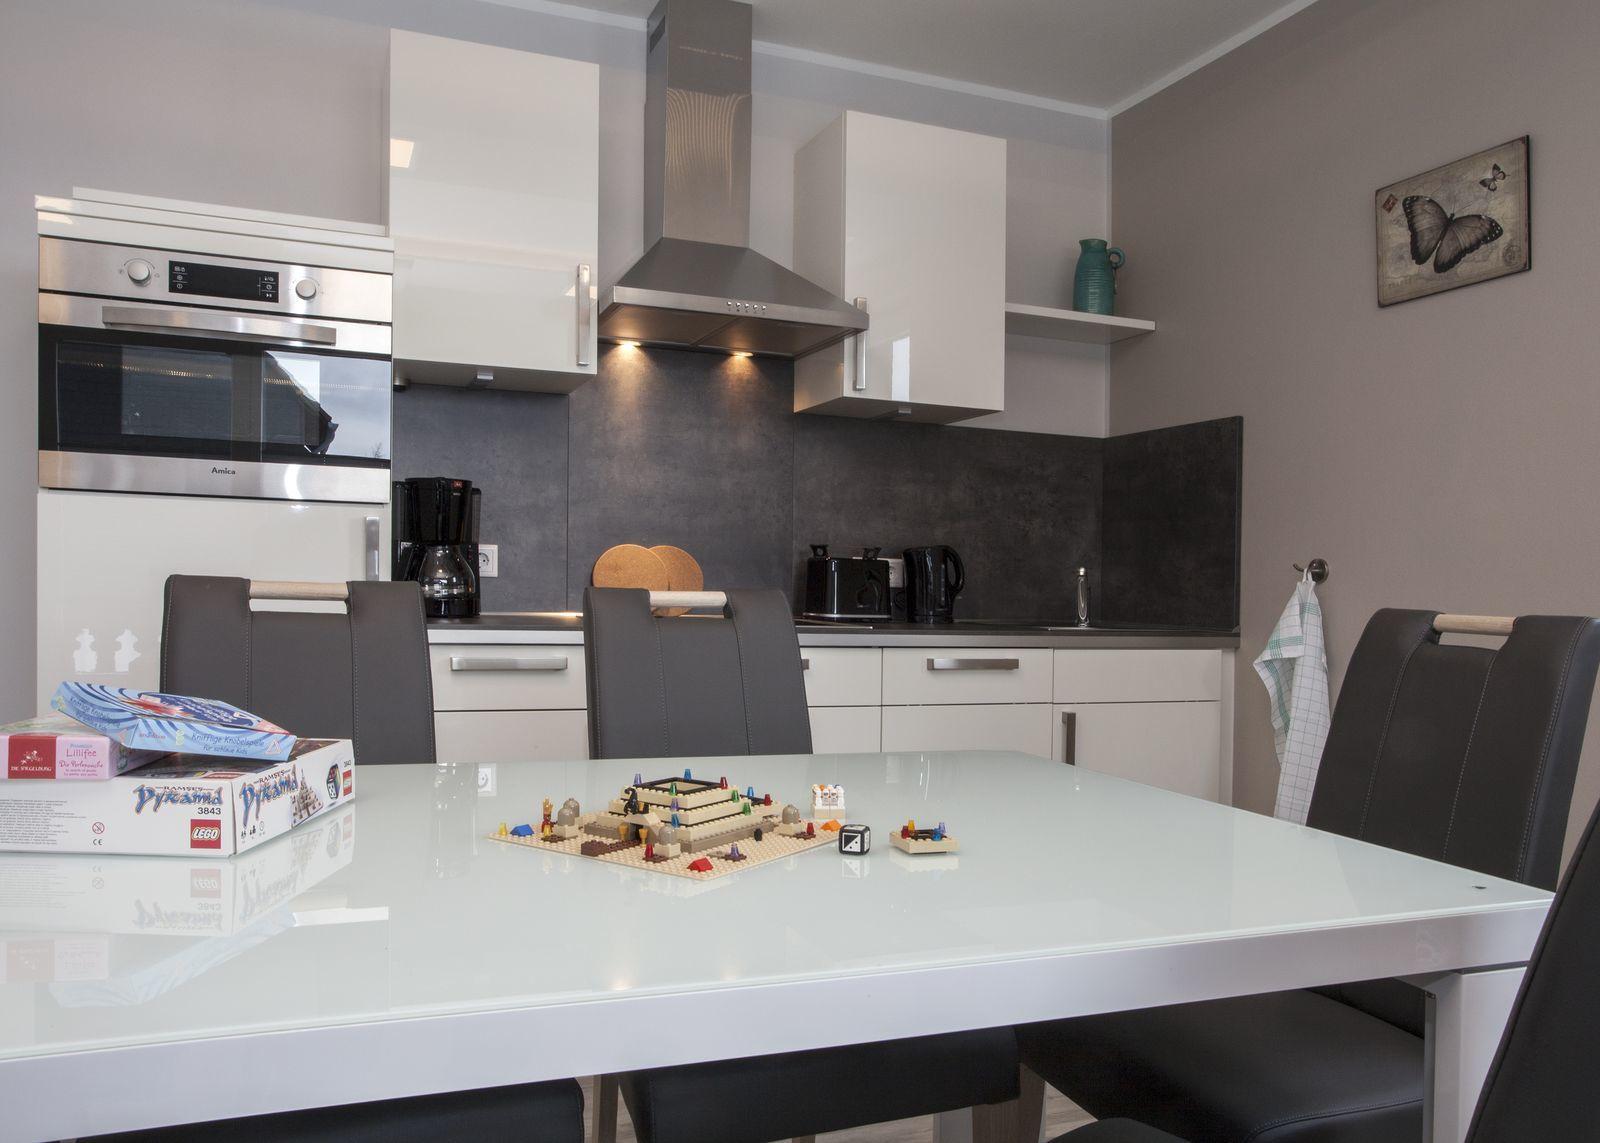 Apartment - Comfort 6 Persons